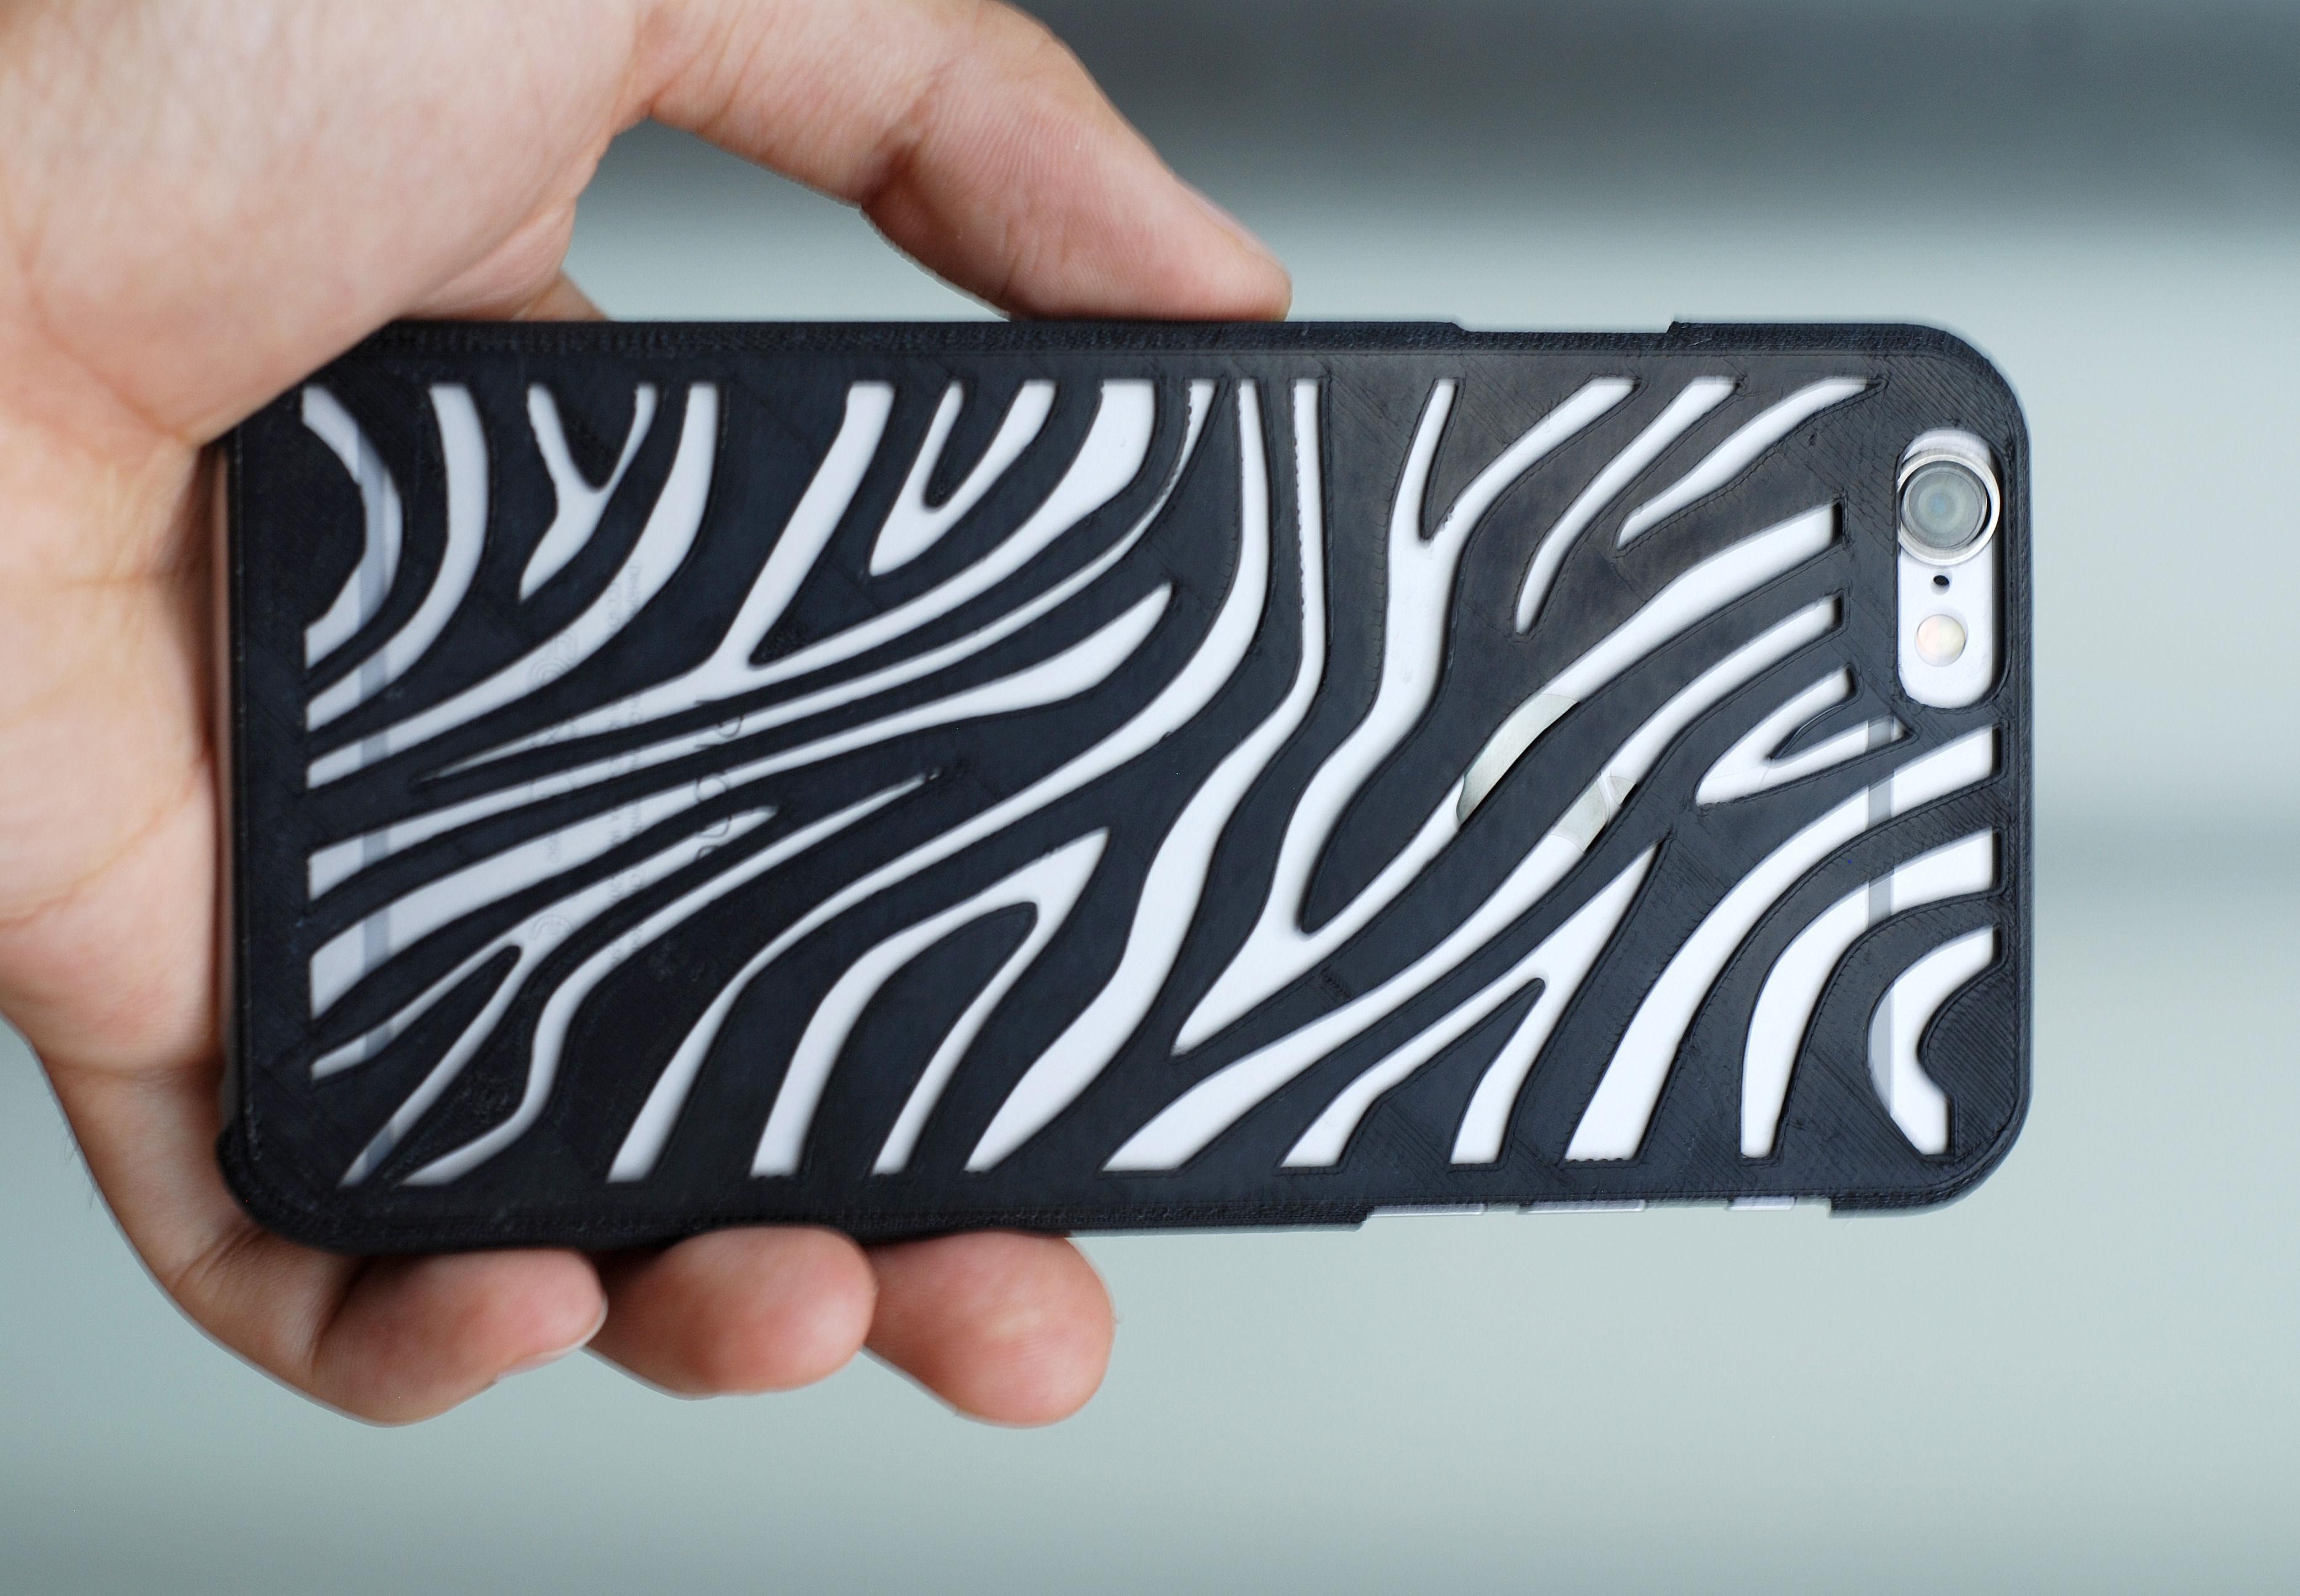 best loved cf086 d97c1 Iphone 6 Case Zebra   3D Print Model